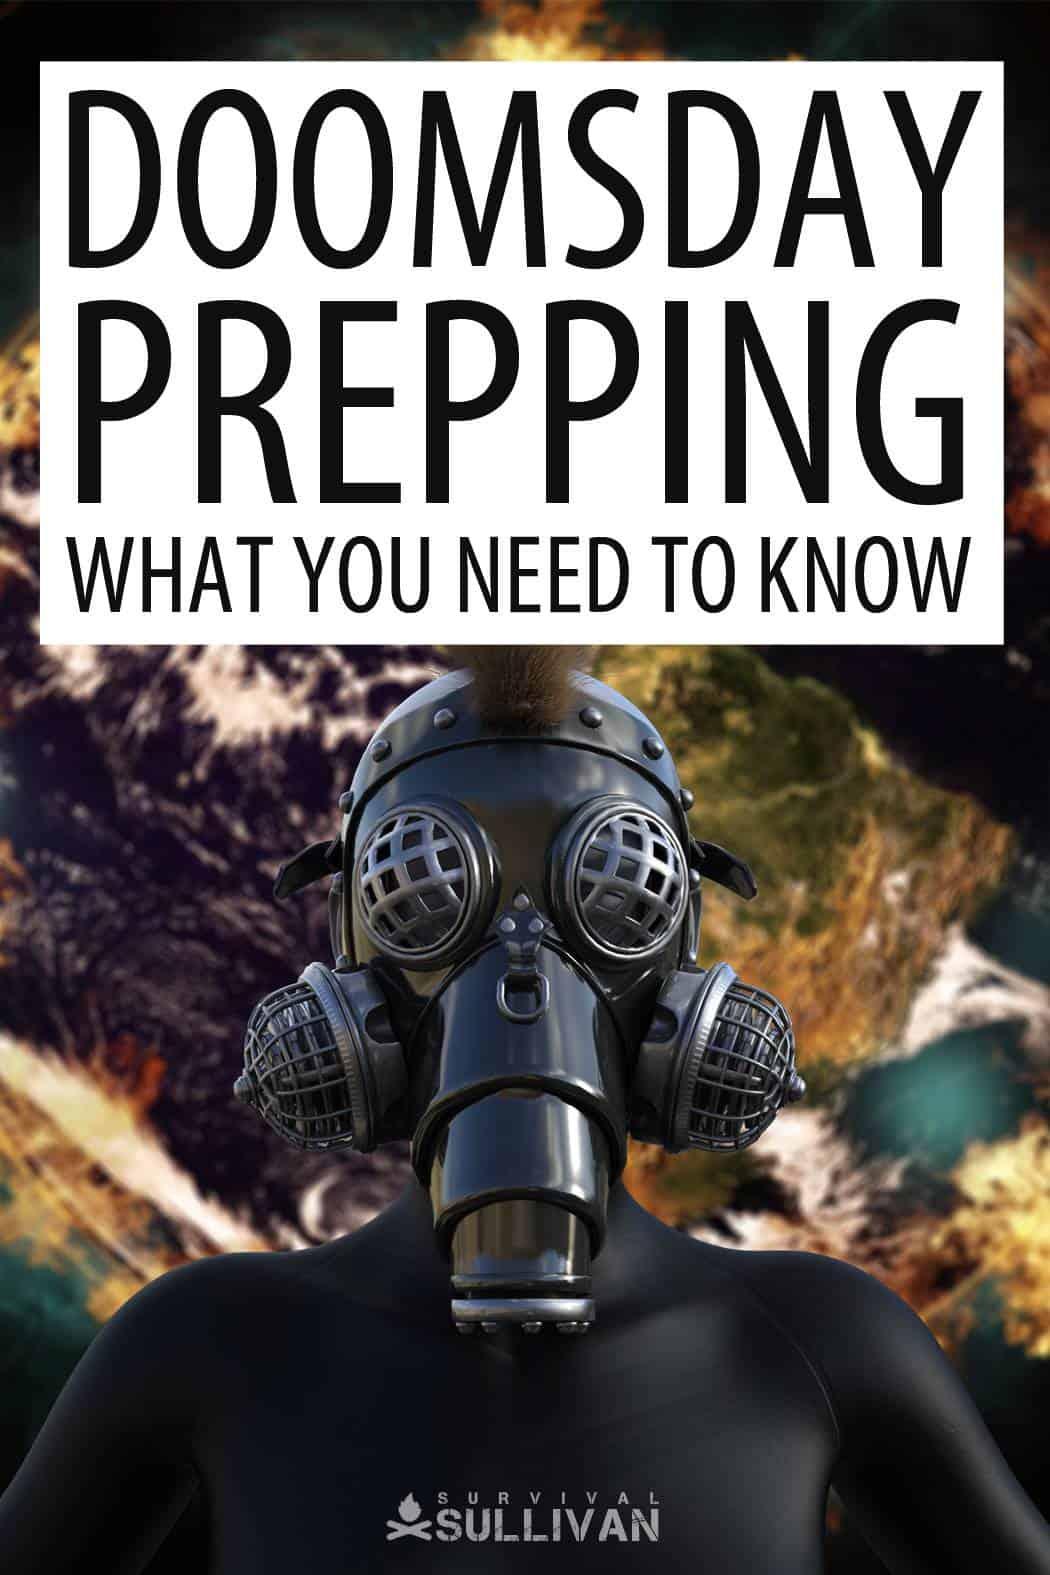 doomsday prepping Pinterest image